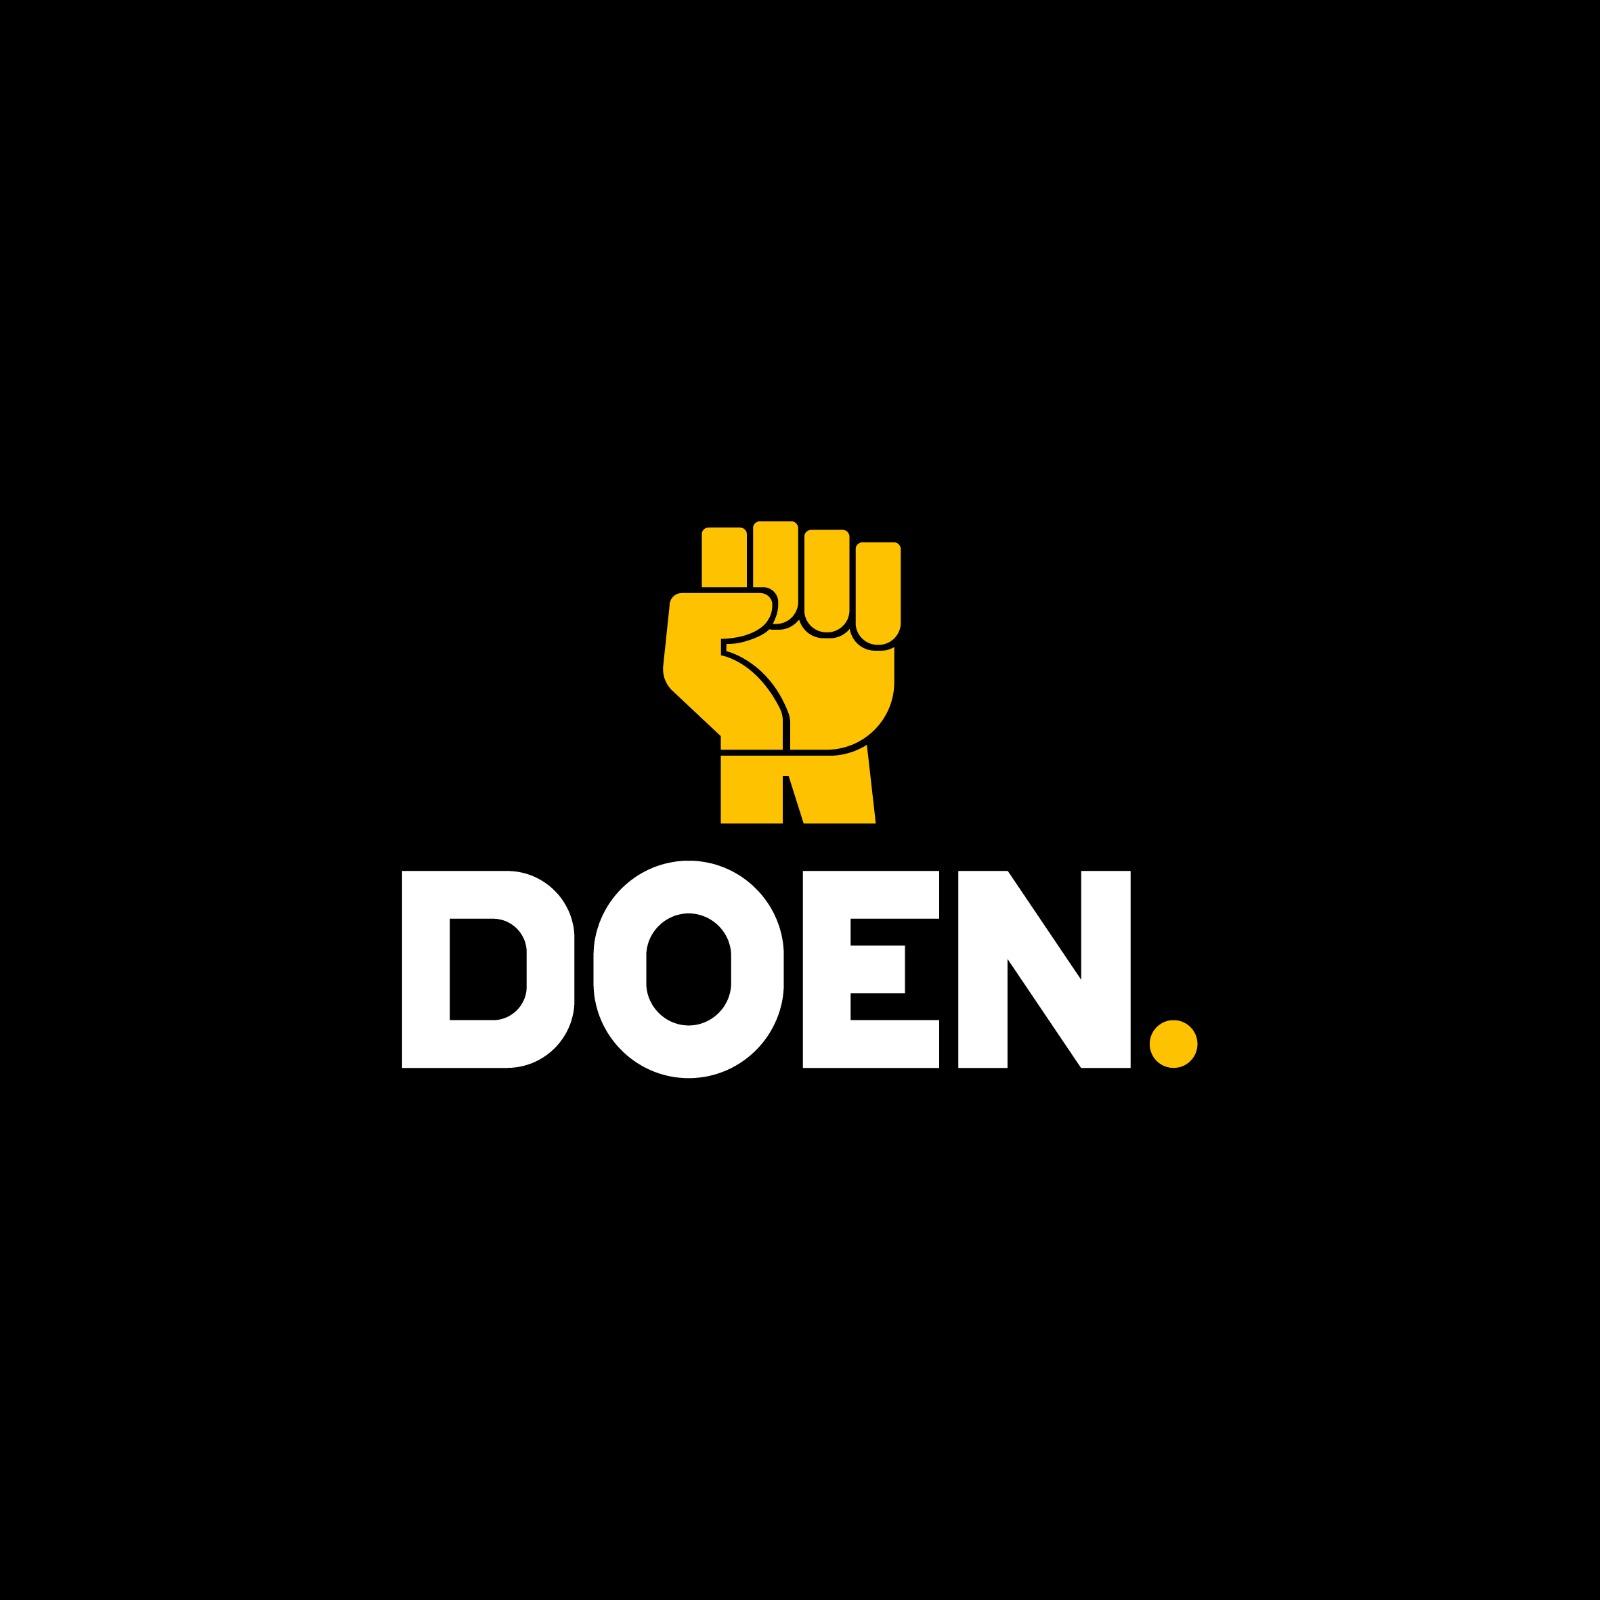 Logo DOEN